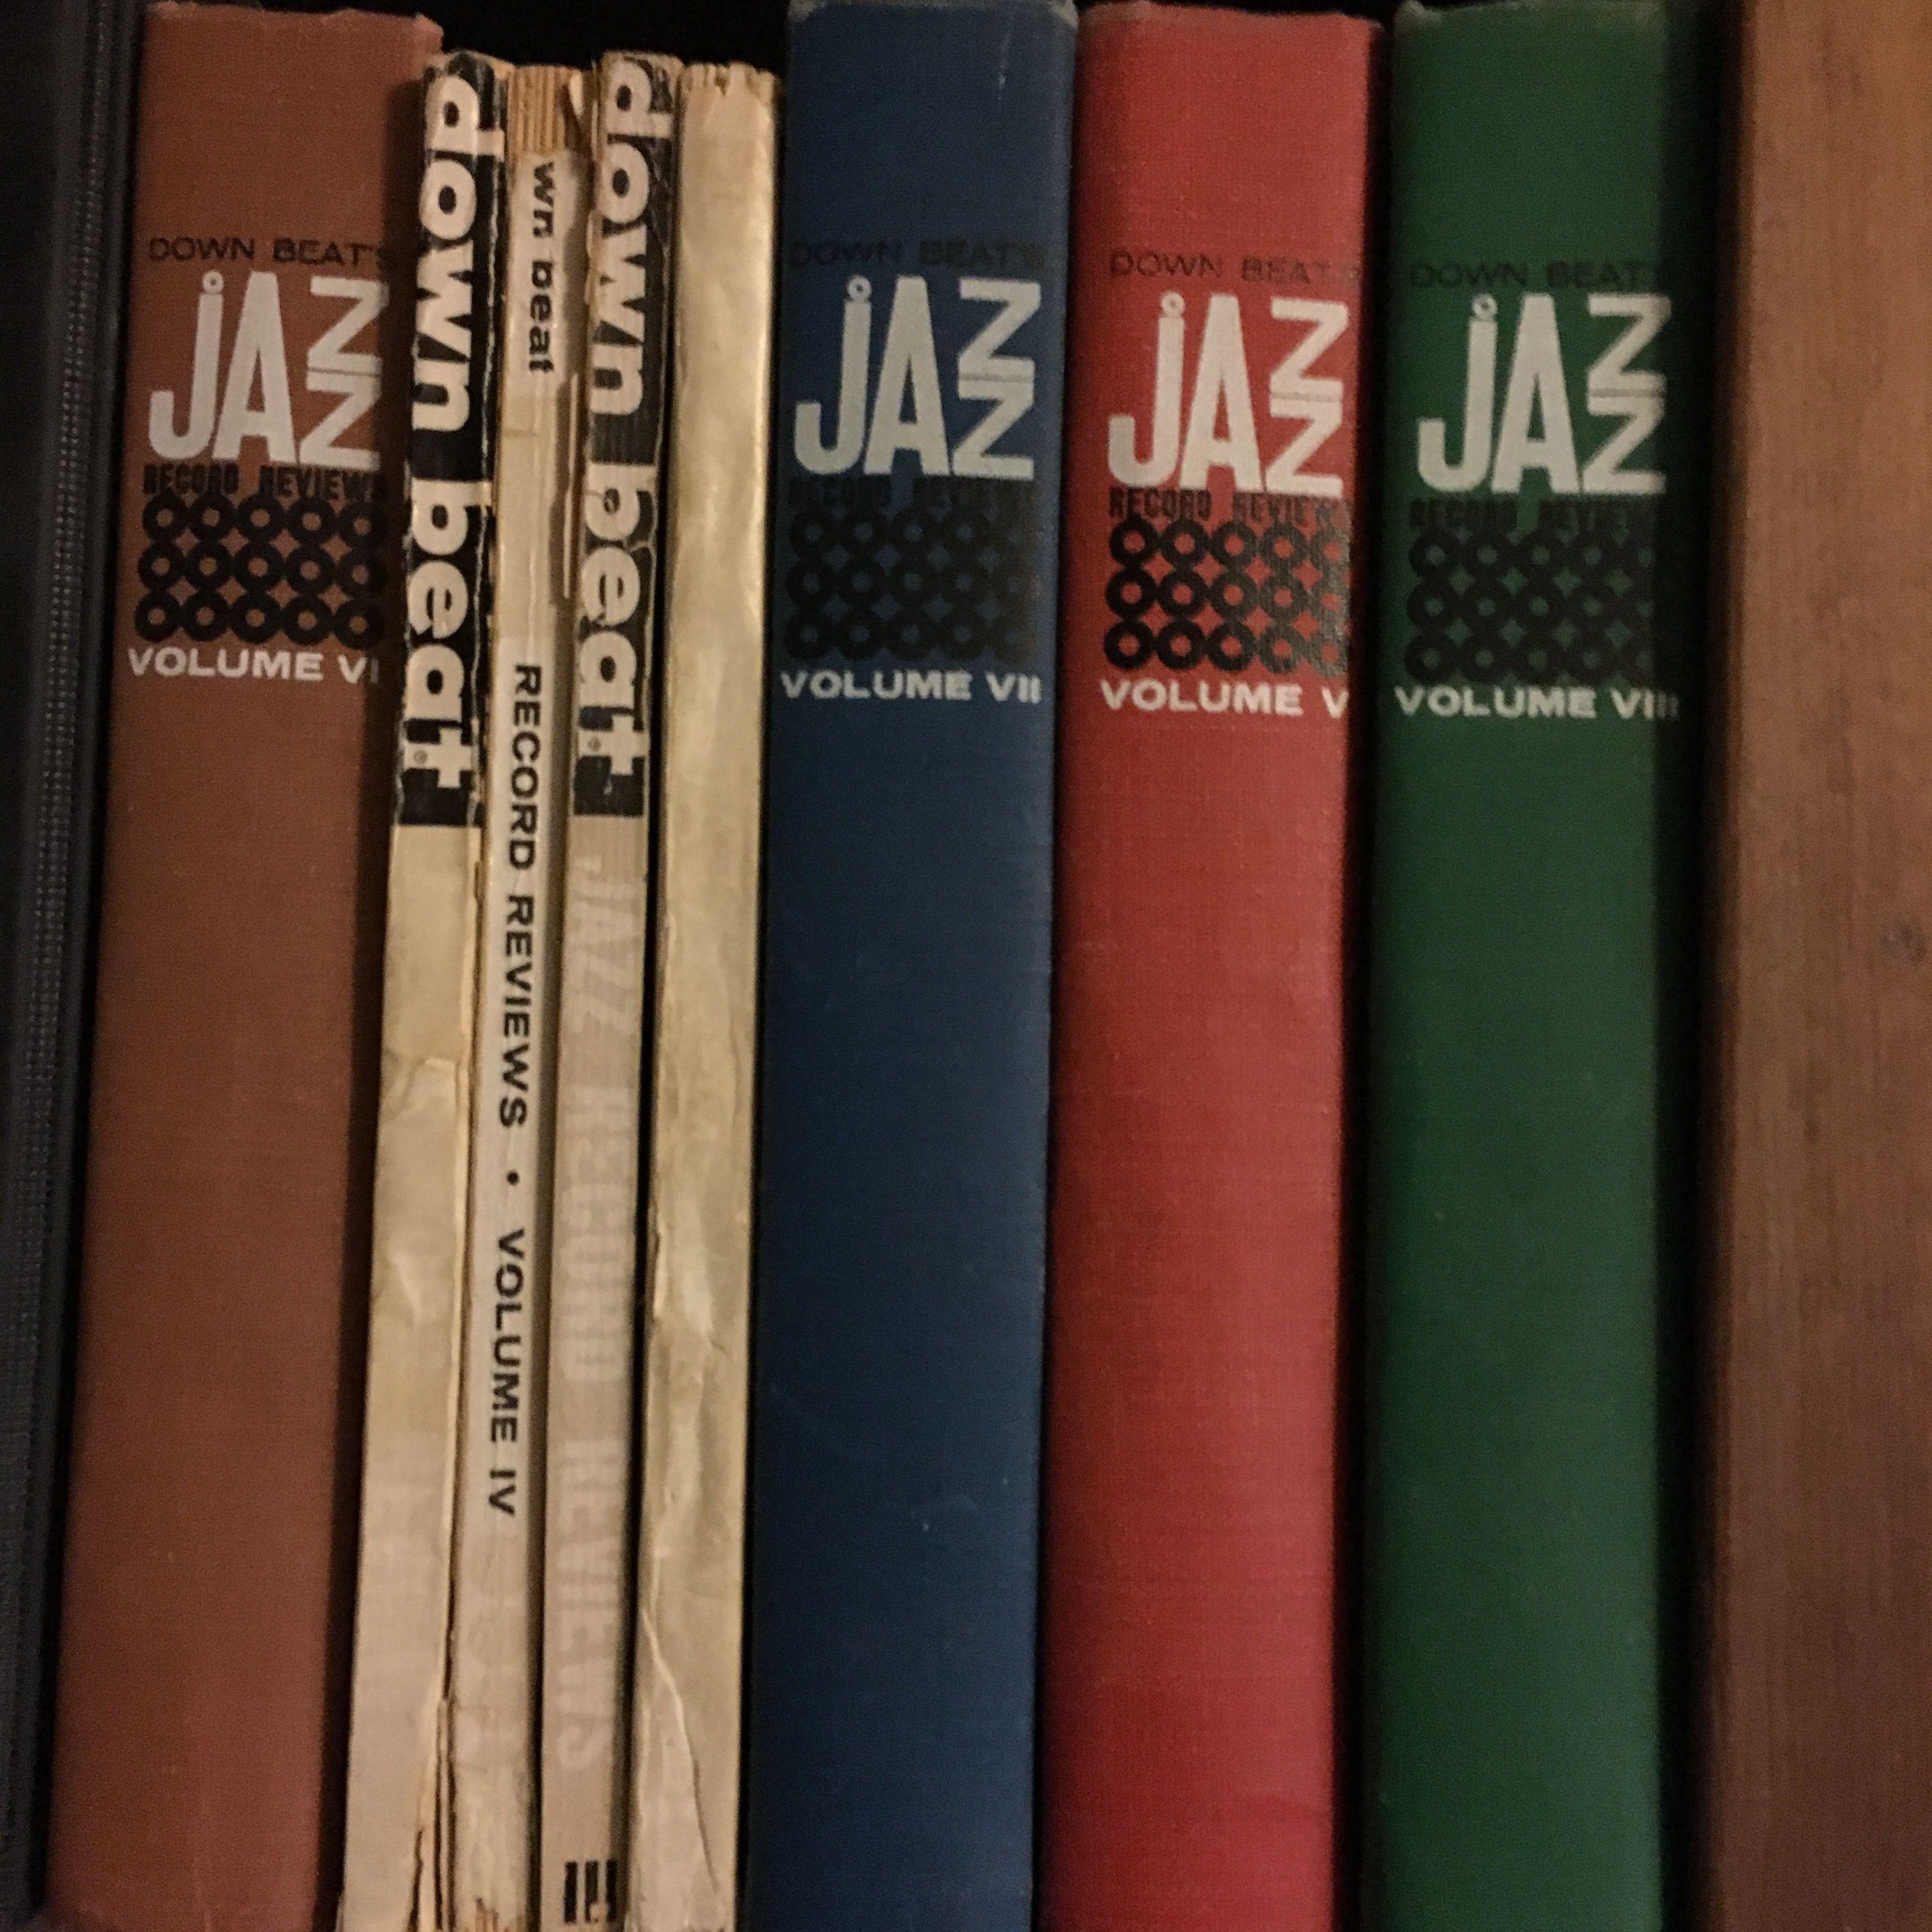 Downbeat Jazz Reviews volumes | Jazz: books, magazines & ephemeral